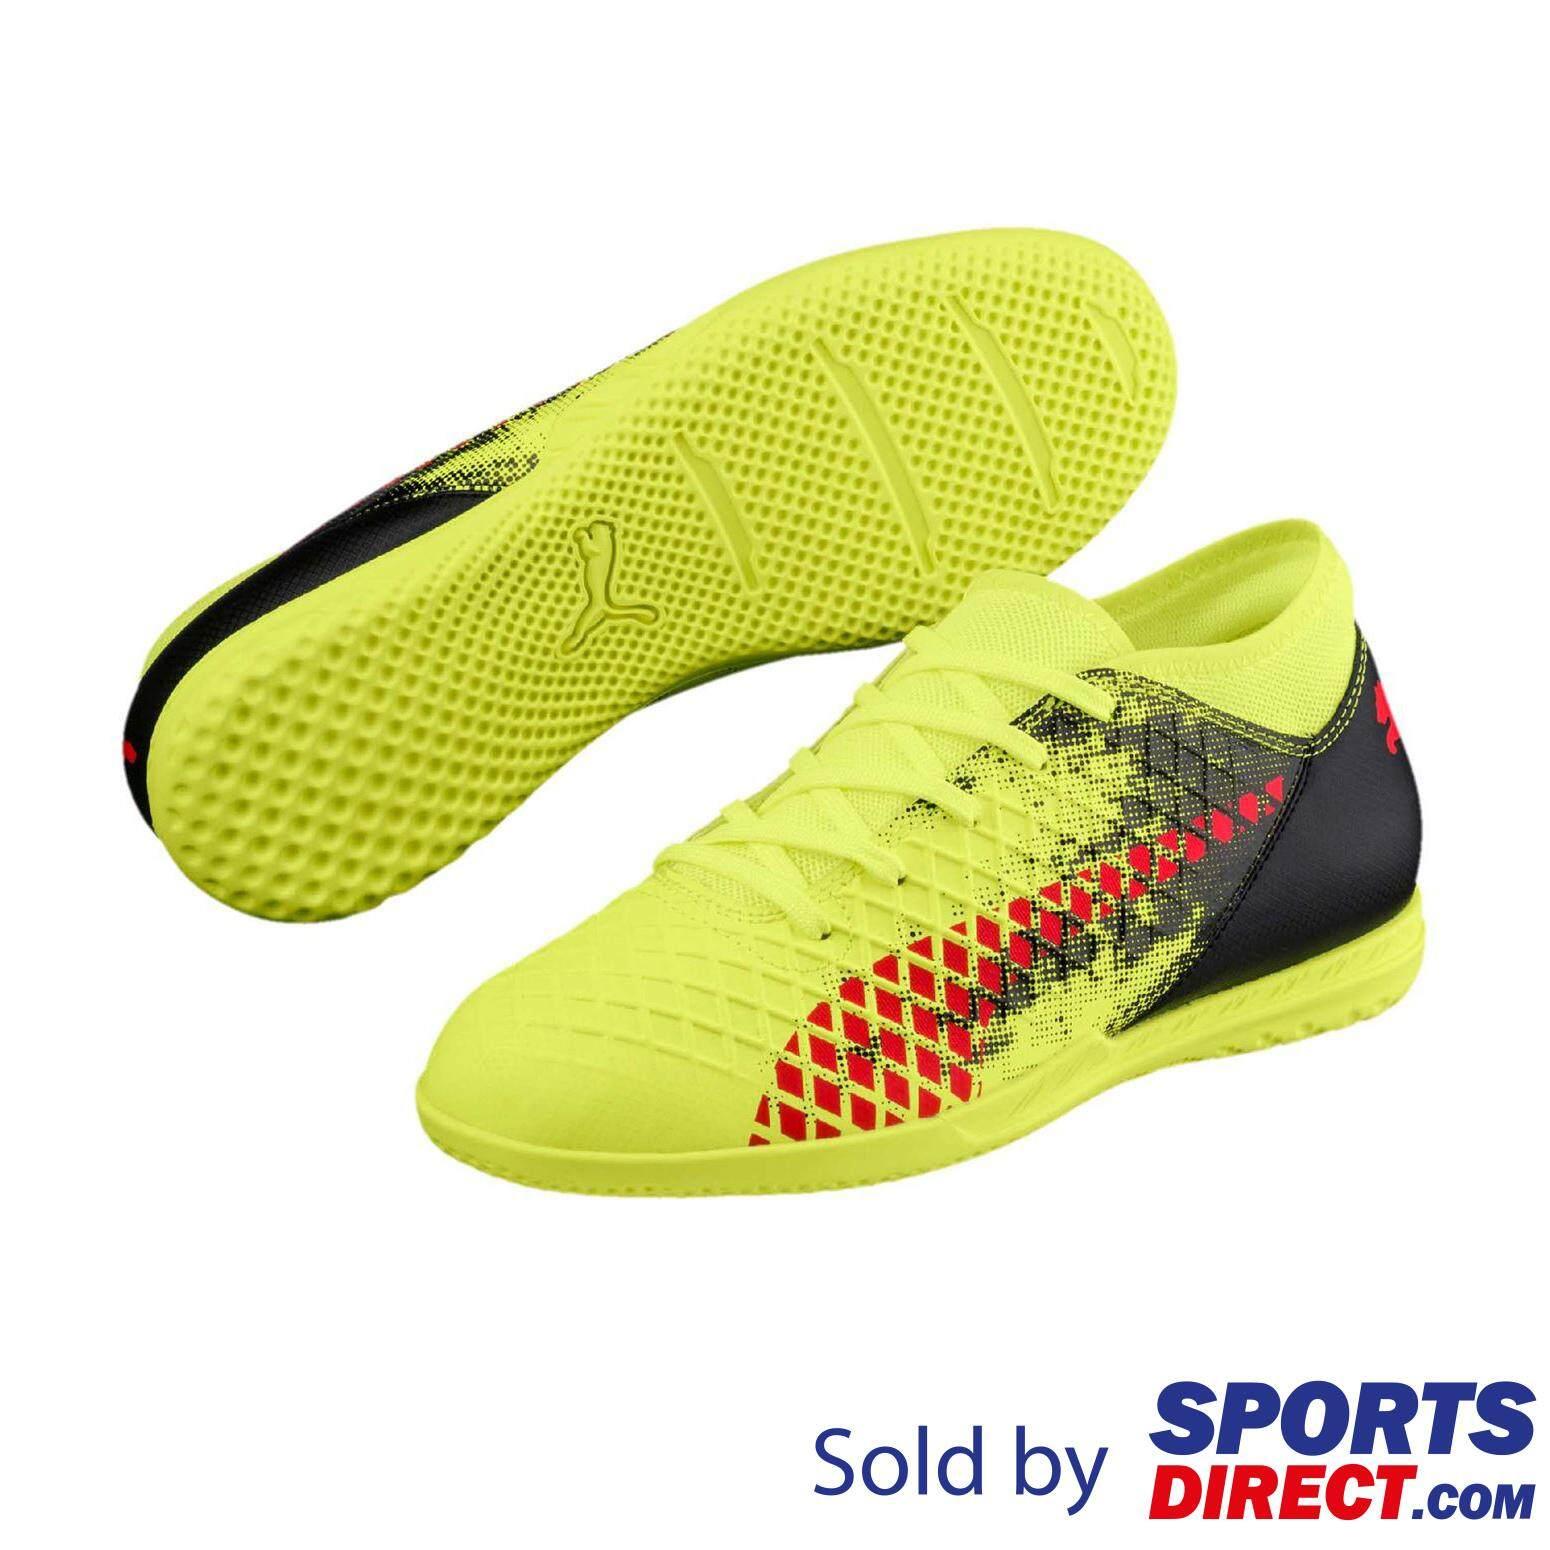 Puma Kids Boys FUTURE 18.4 IT Football Shoes (Yel Red Blk) 5d4129f961934